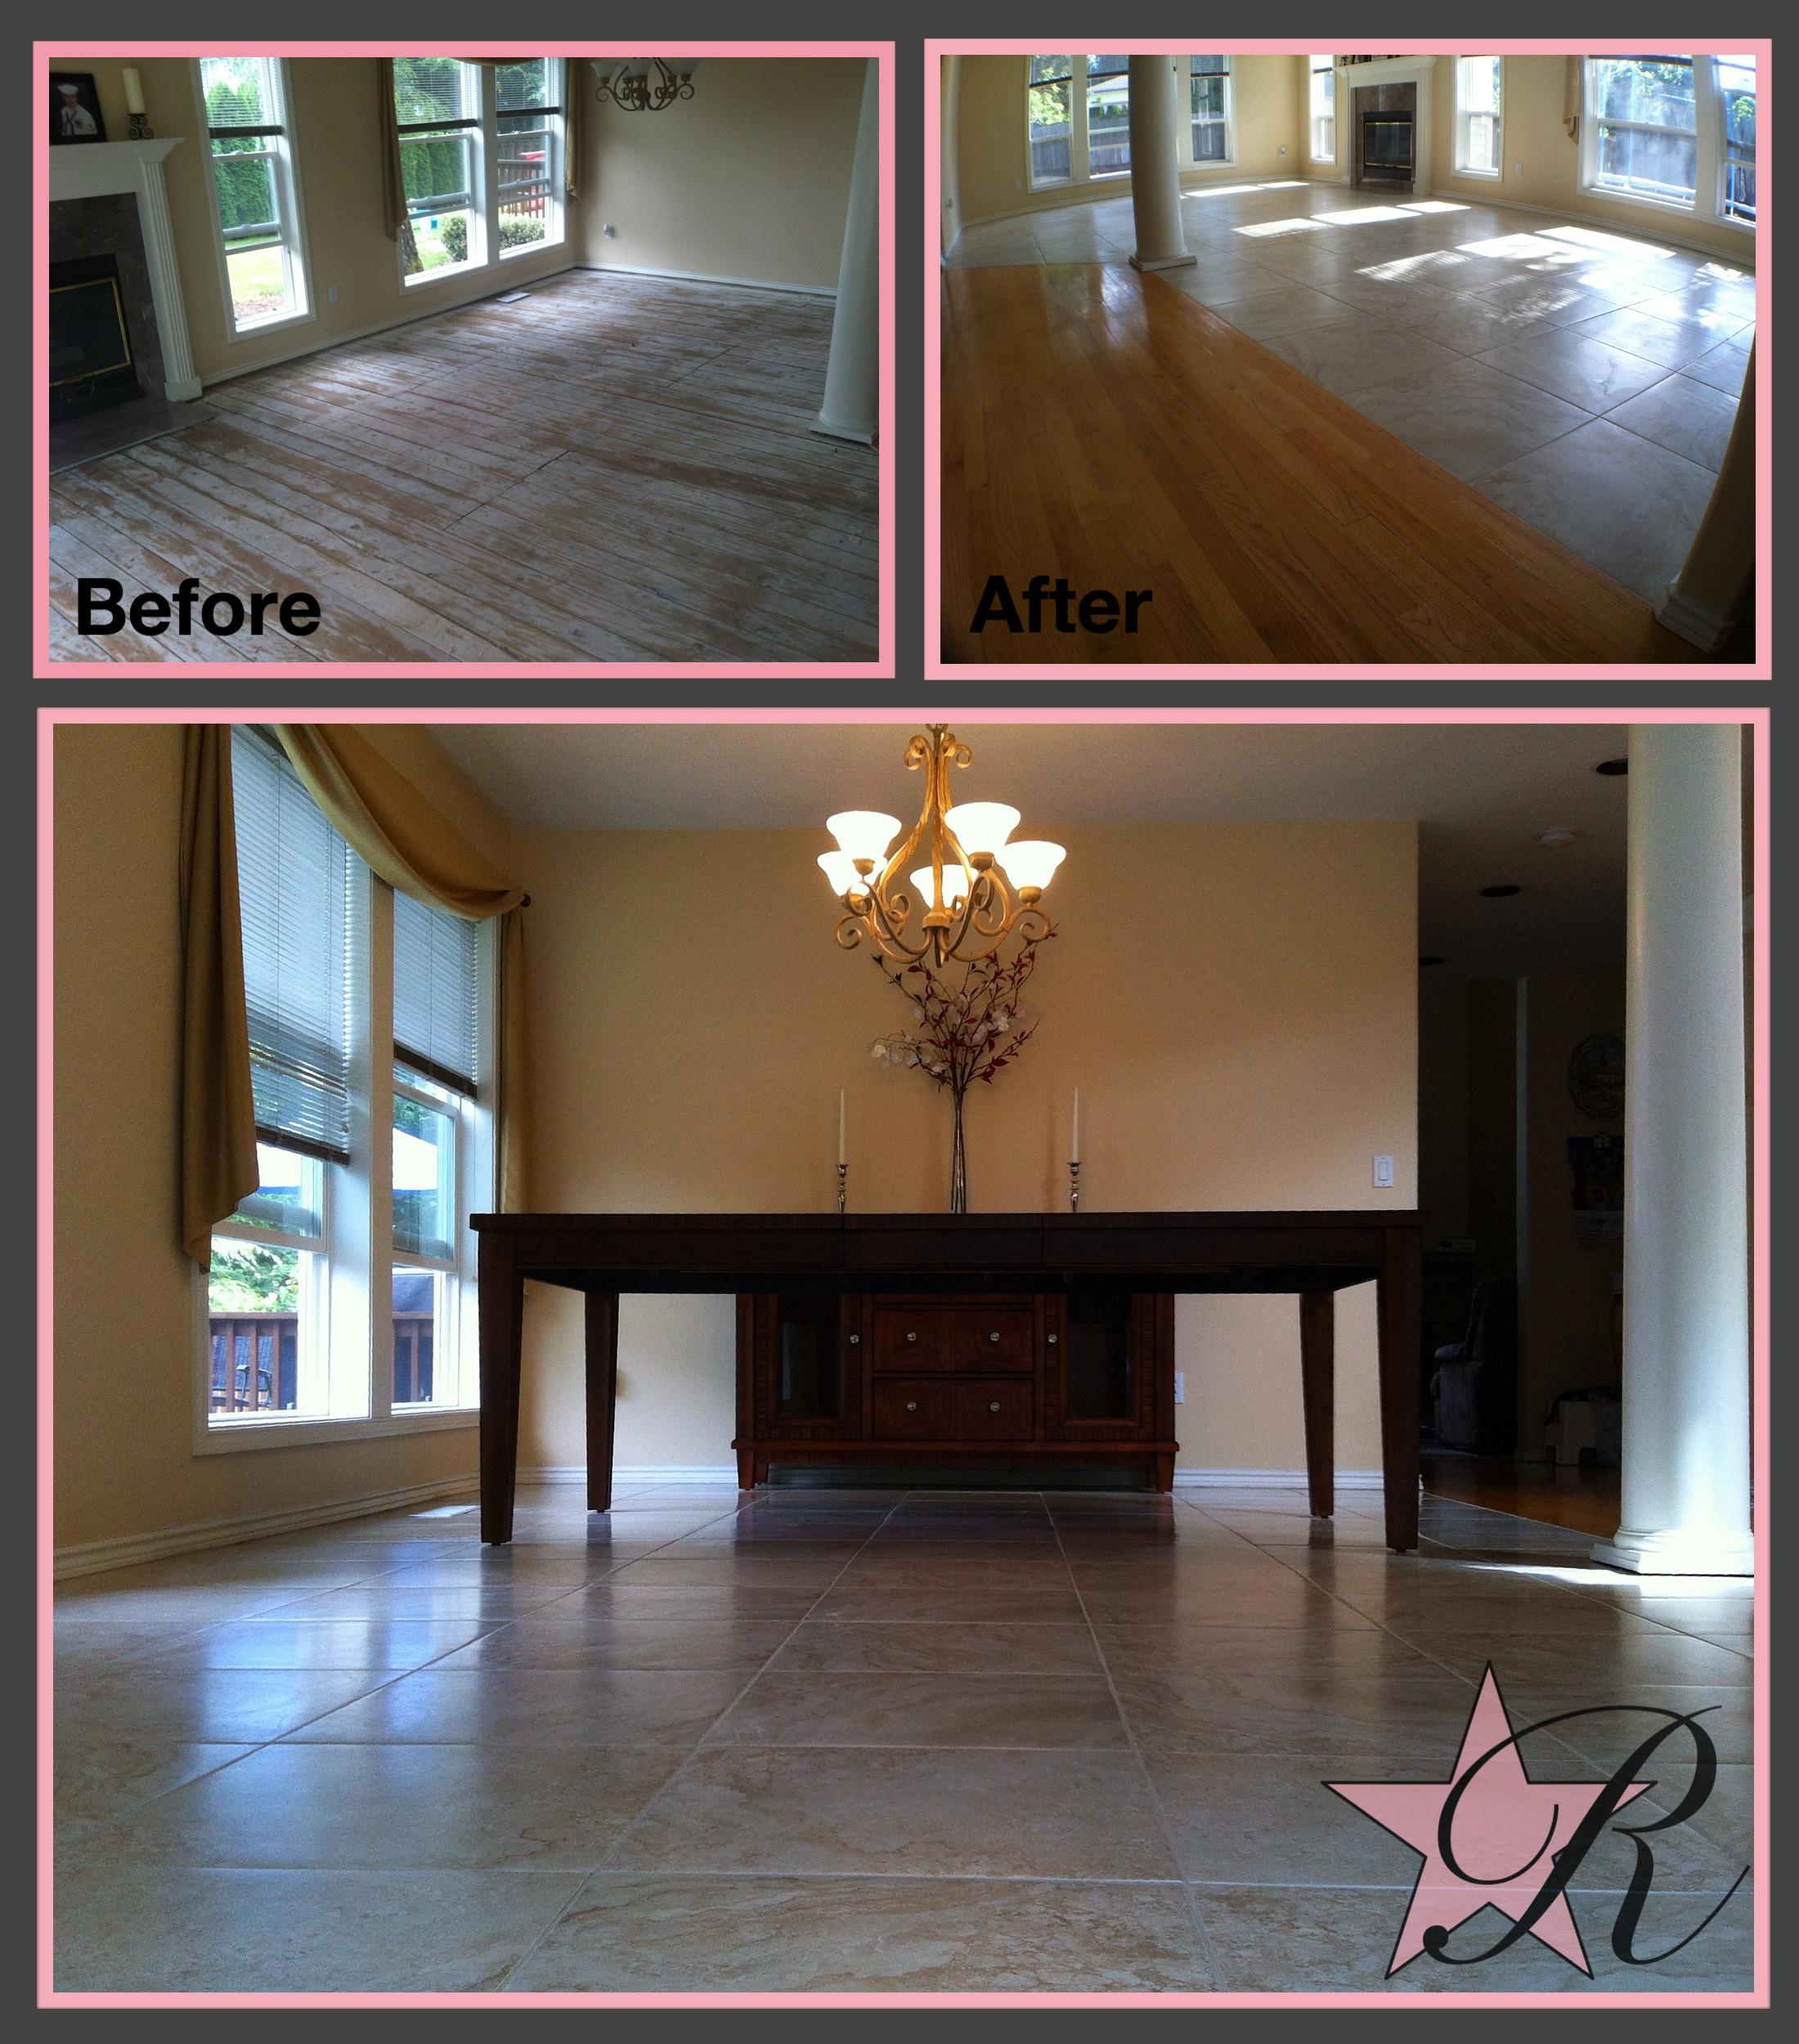 Rockstar Remodel installed a tile floor in this living room.